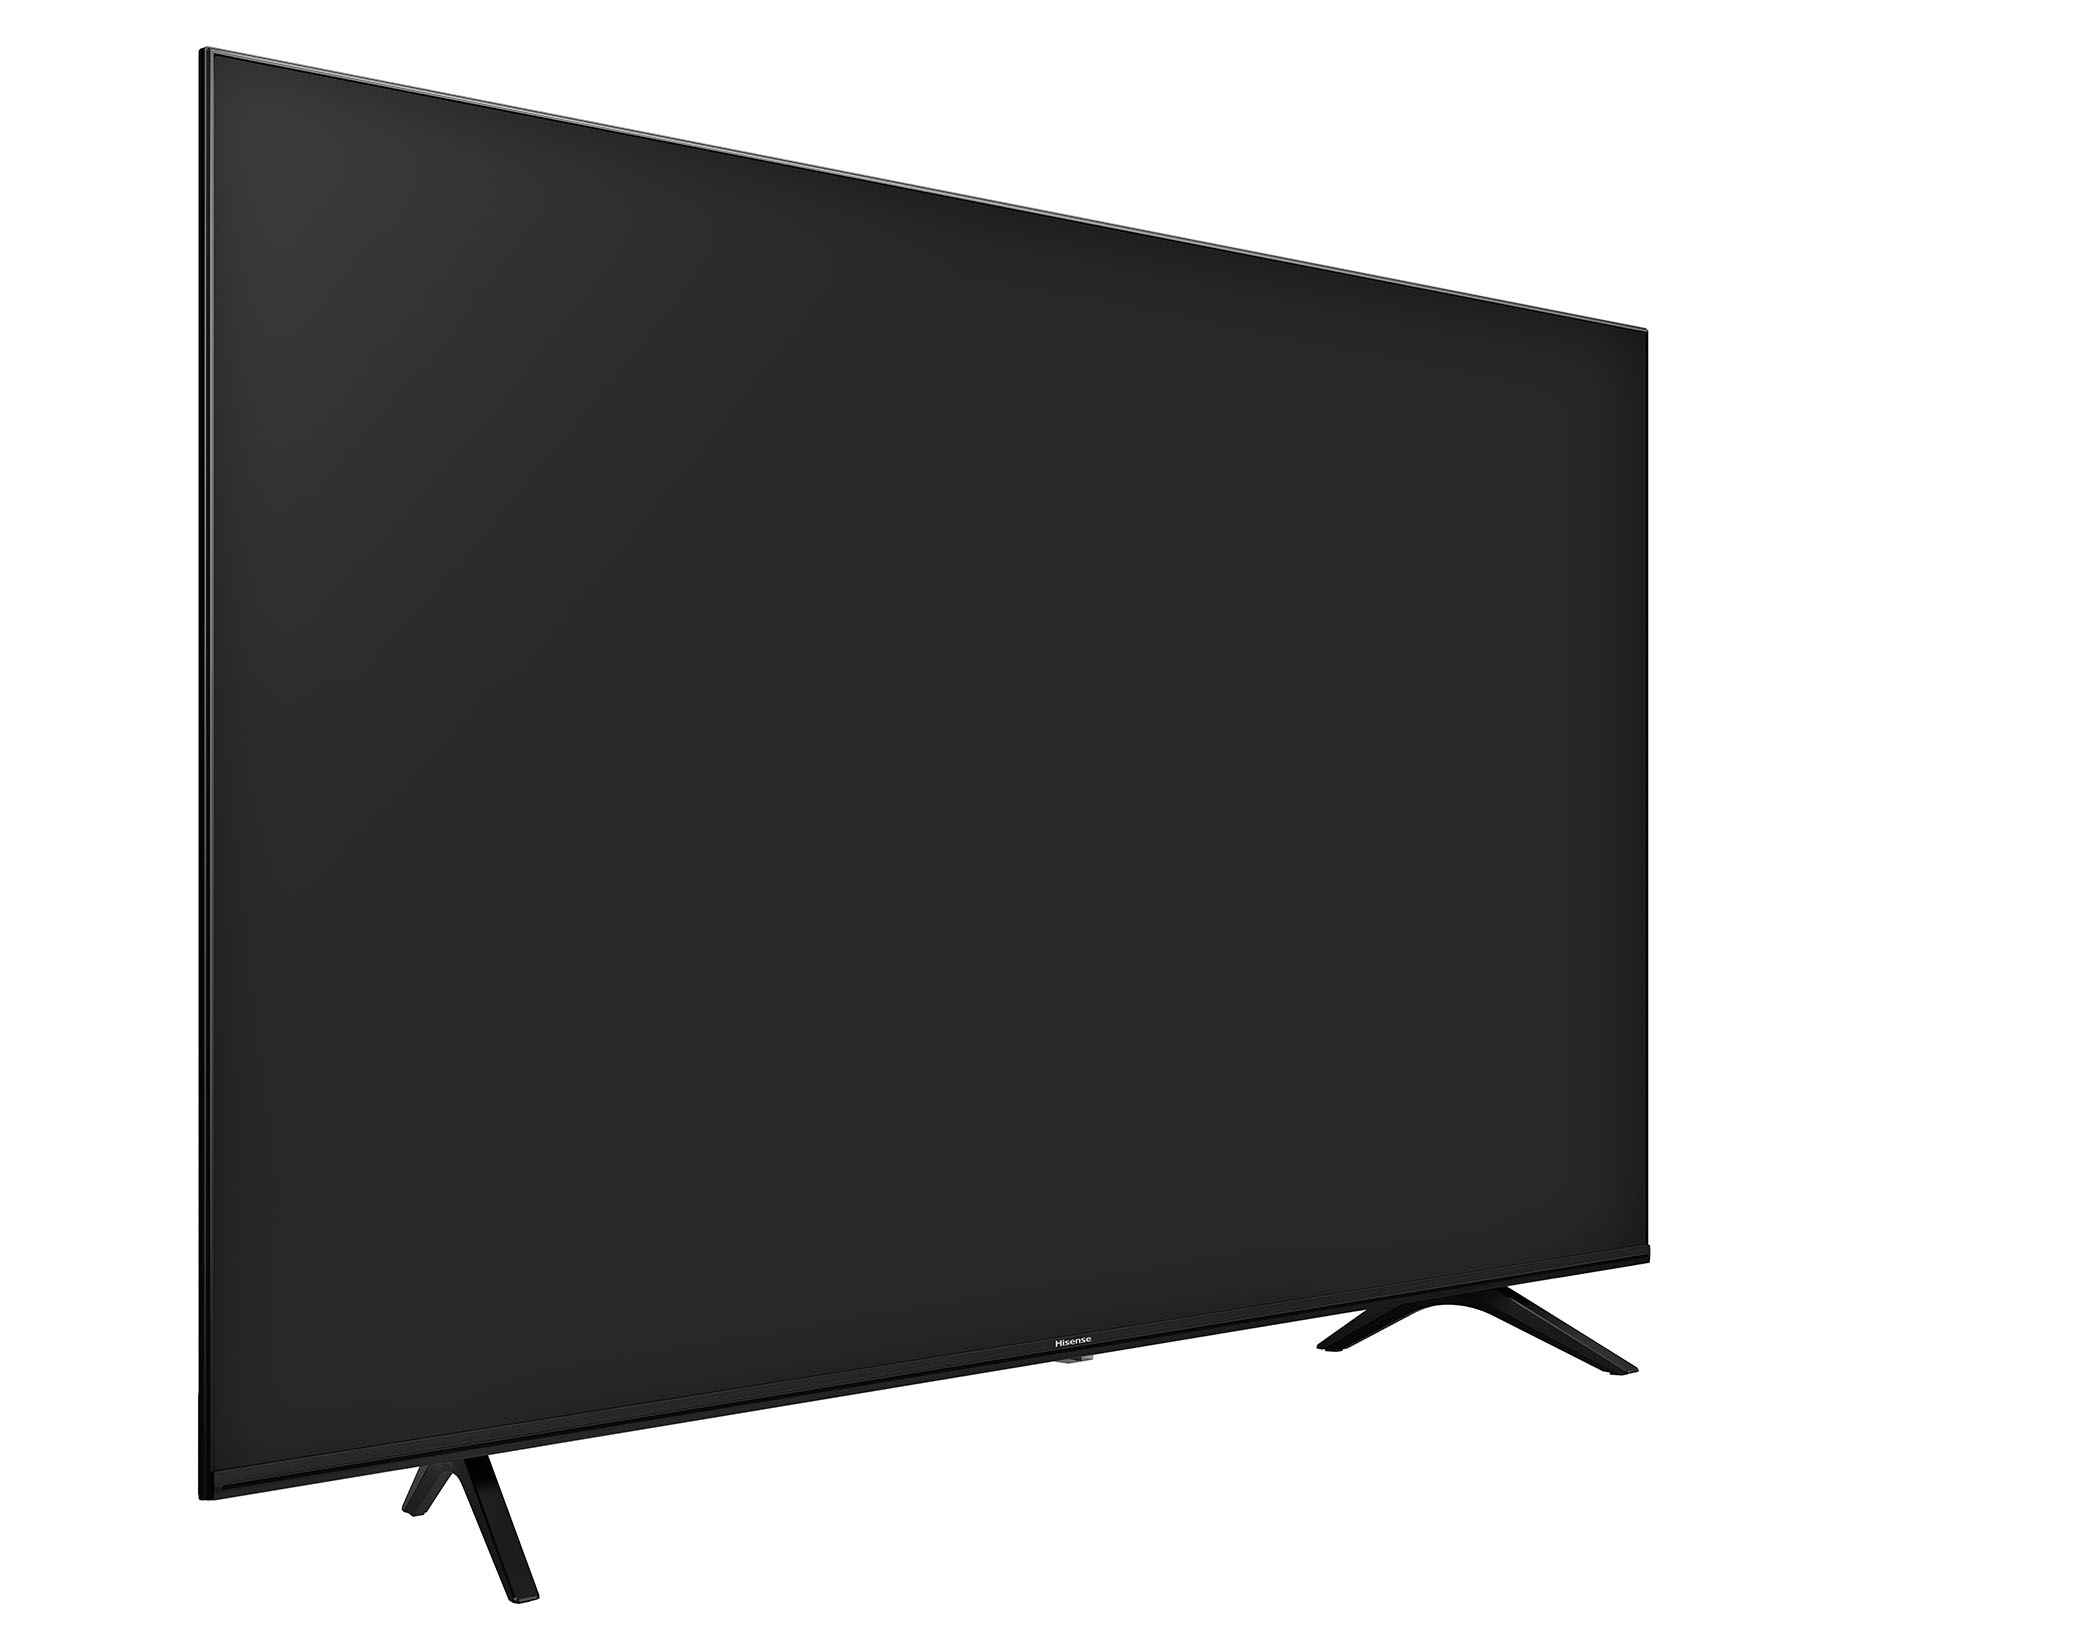 Hisense 58S5 58inch UHD 4K TV SERIES S5 main